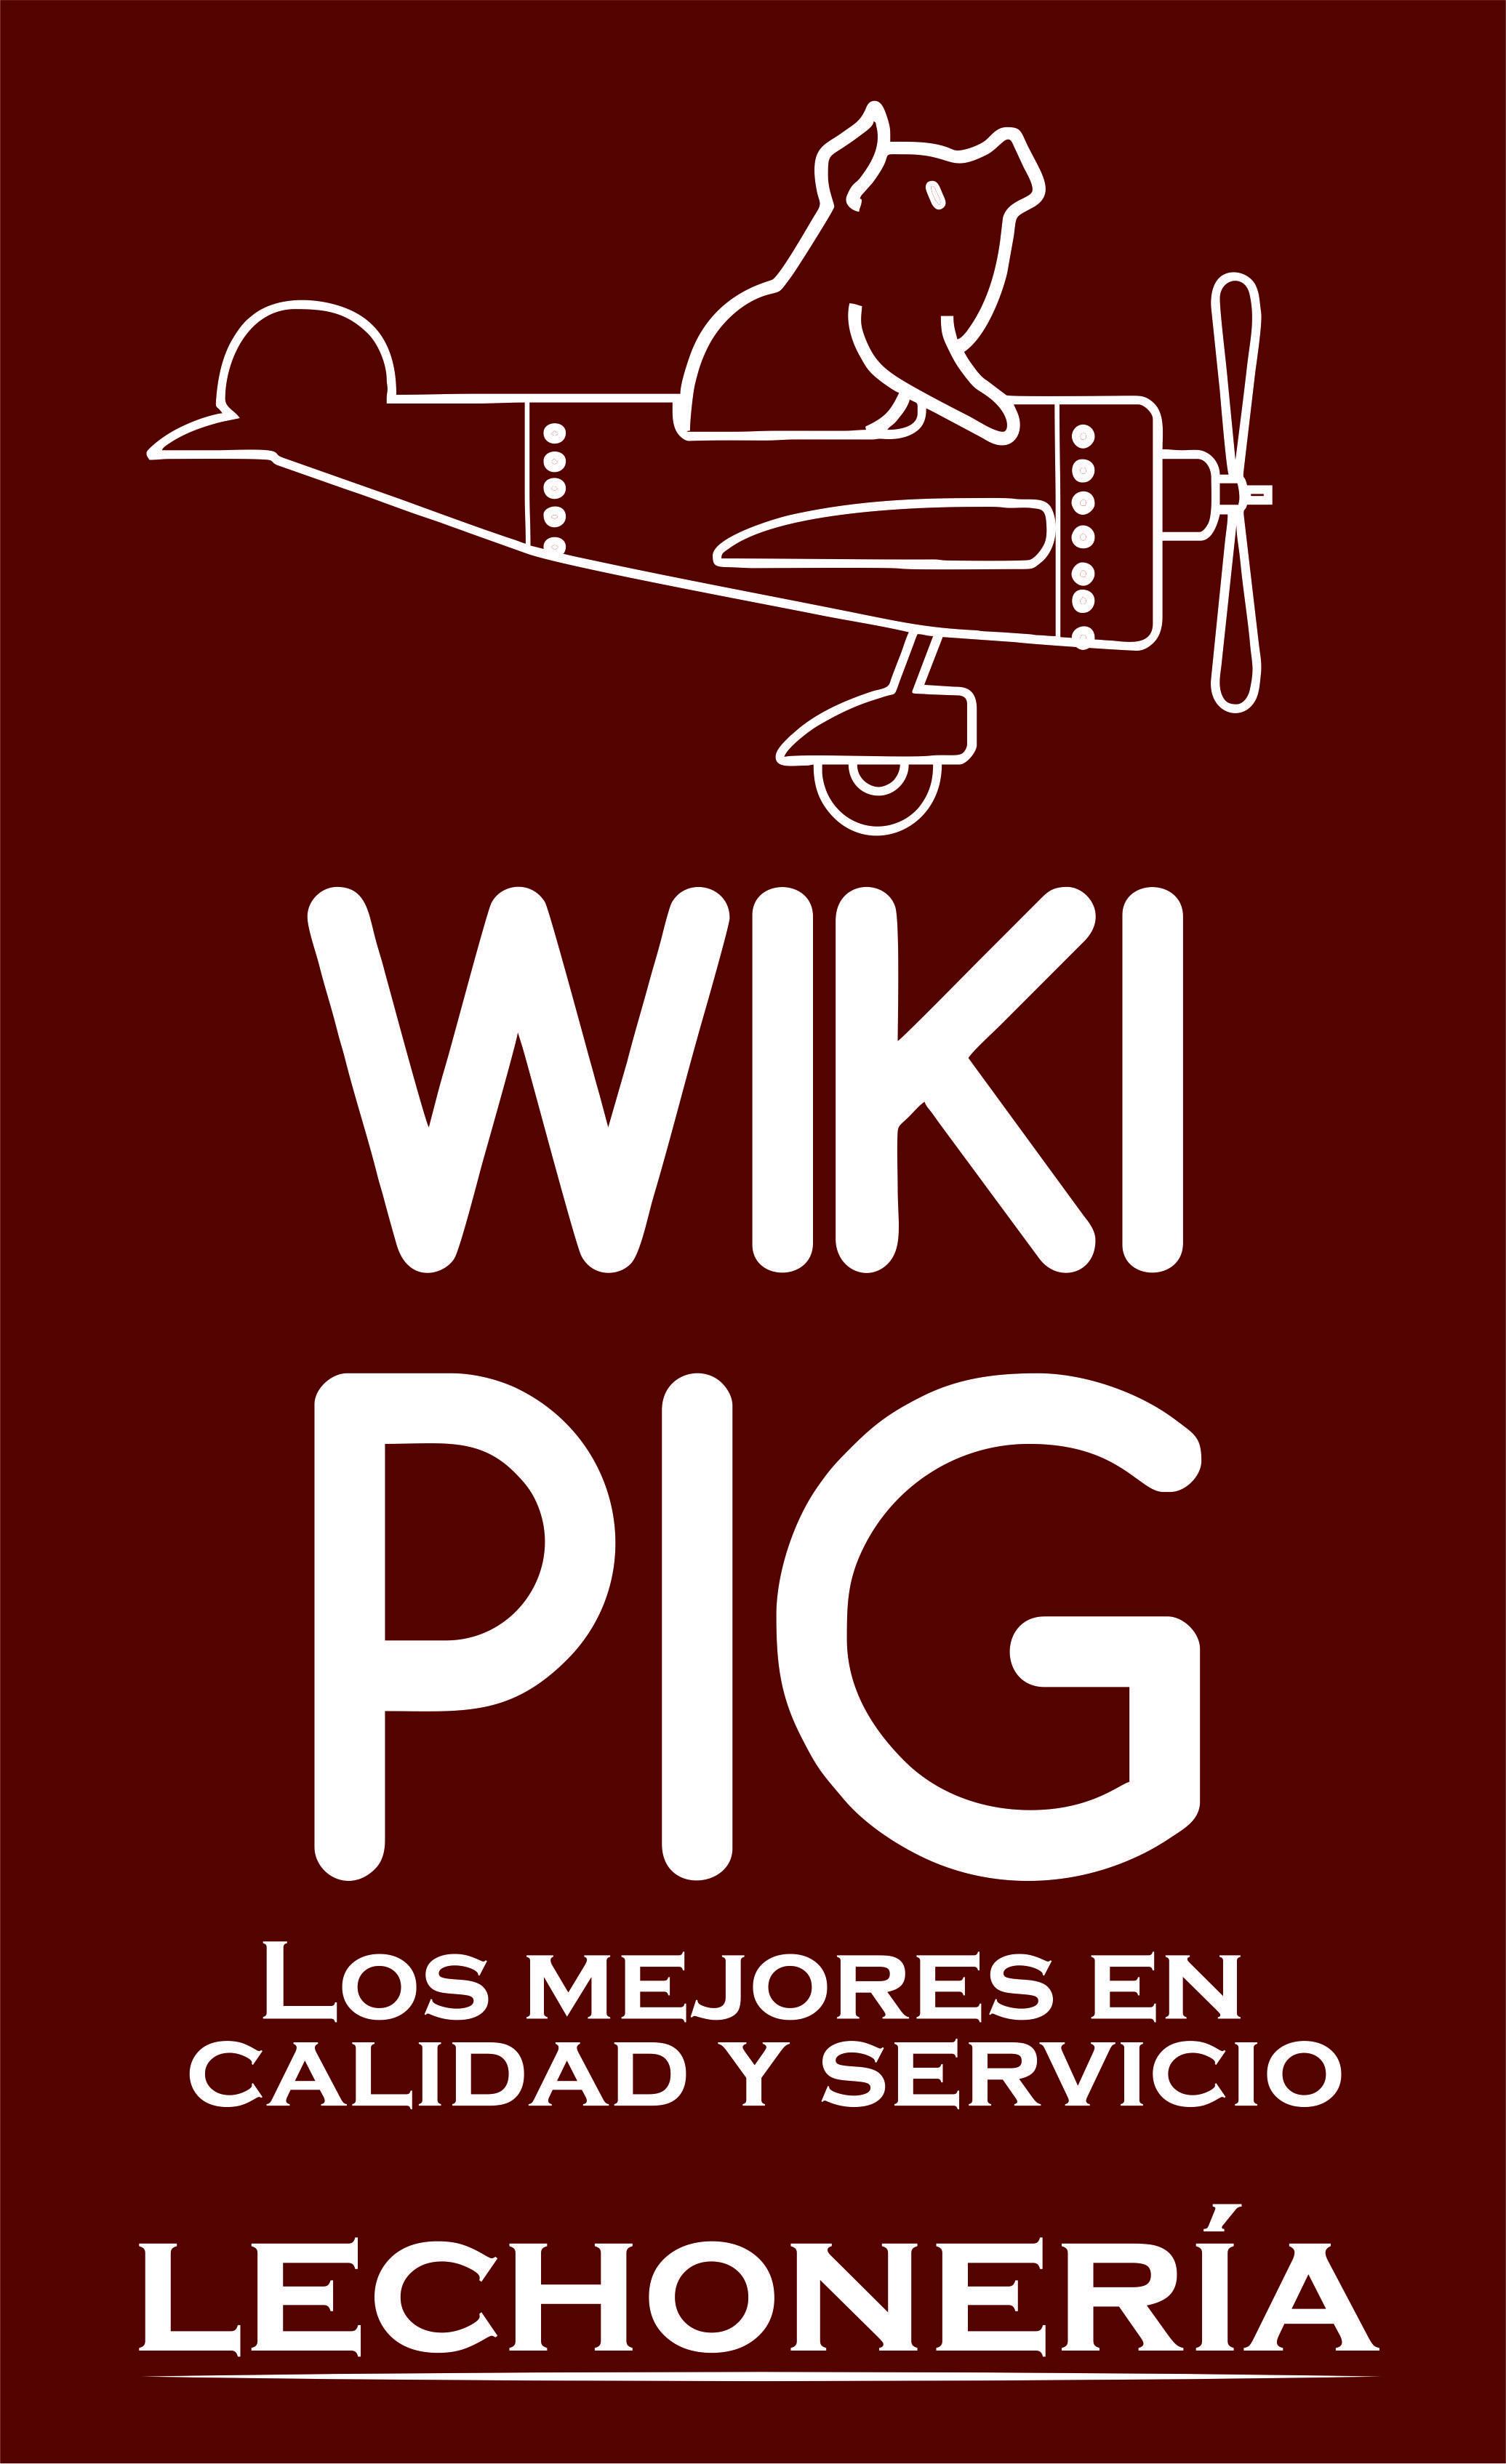 Lechoneria Wiki Pig